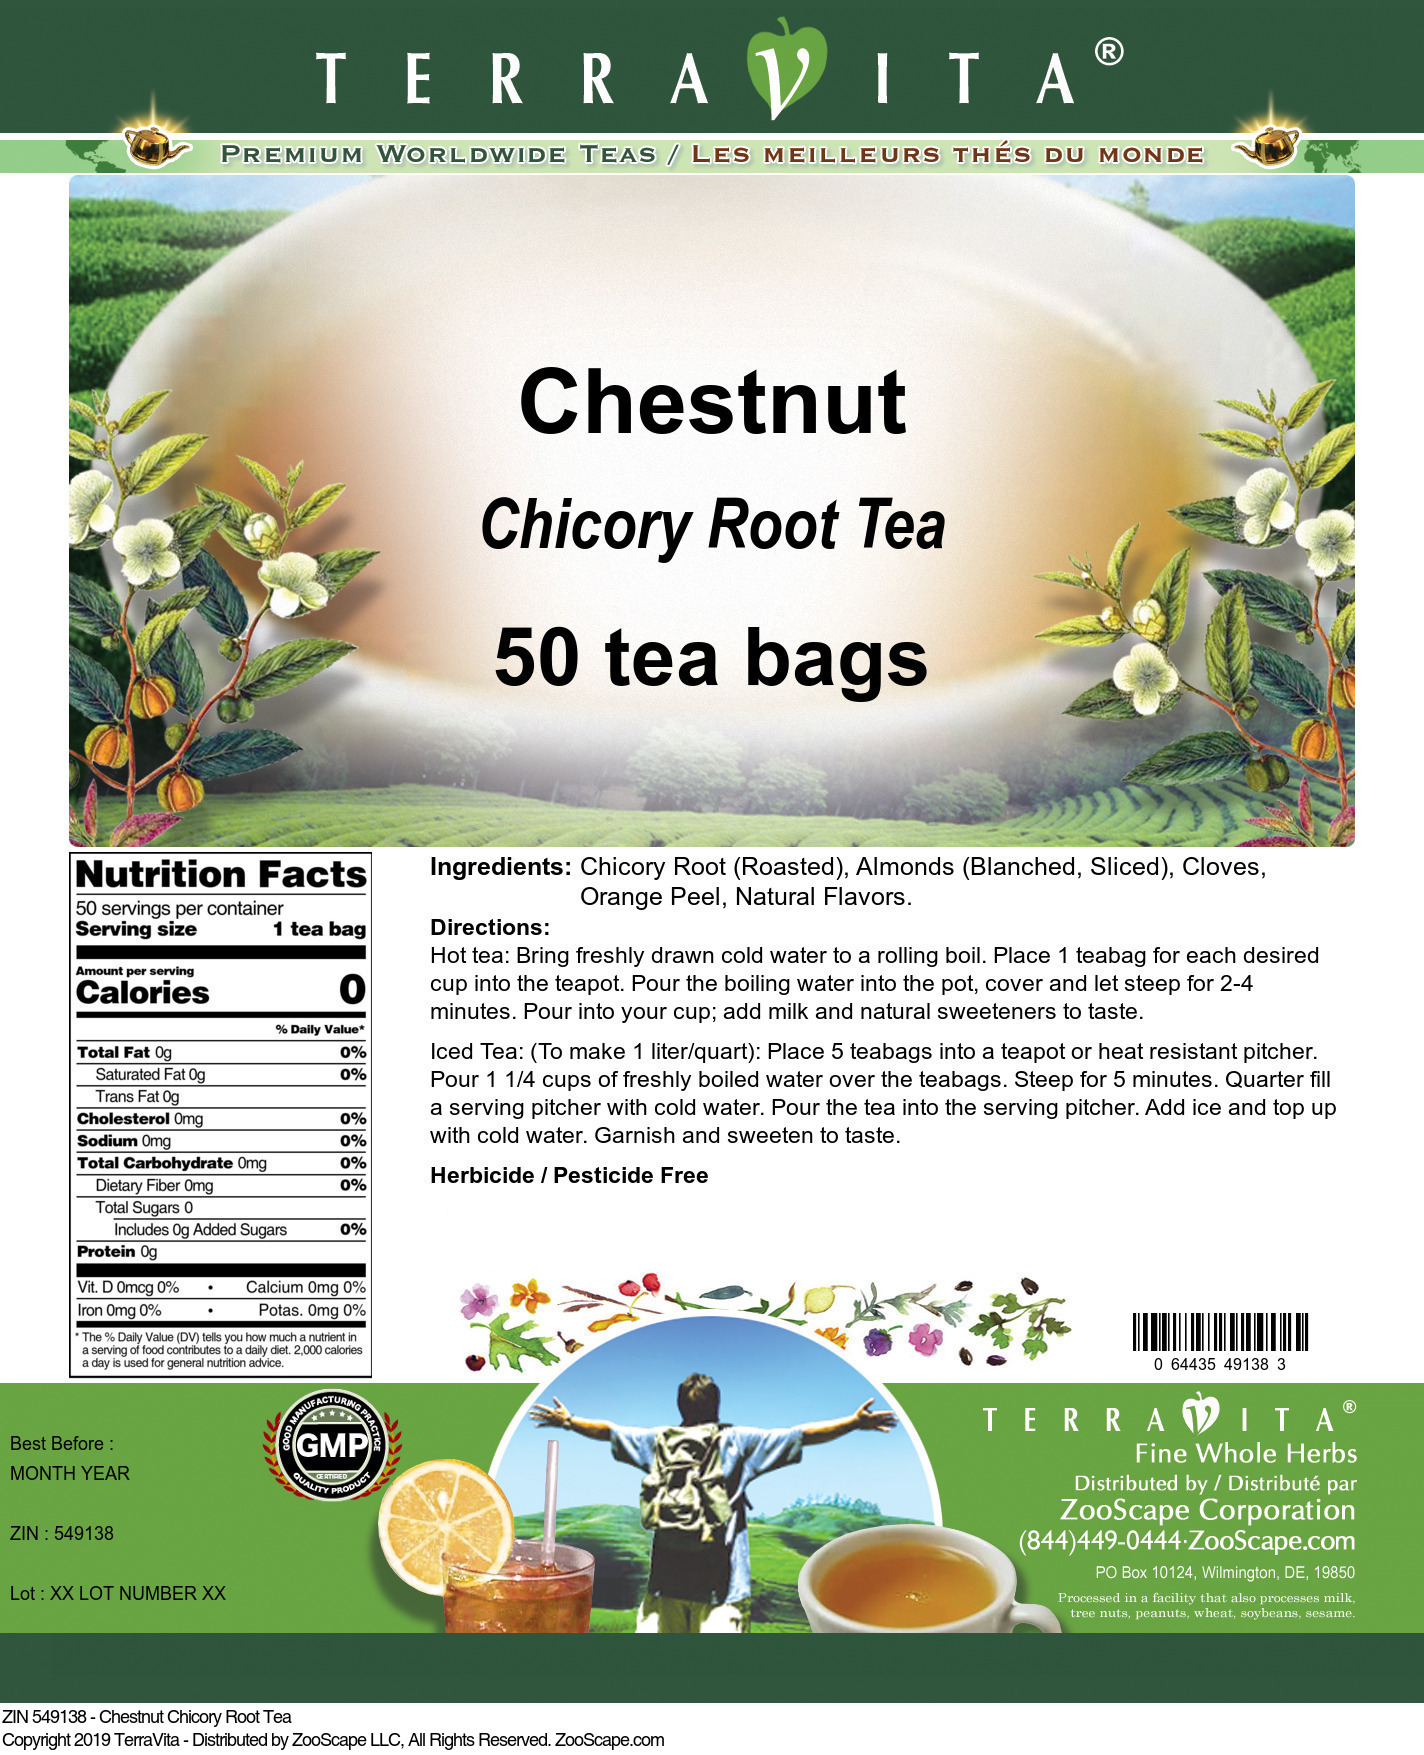 Chestnut Chicory Root Tea